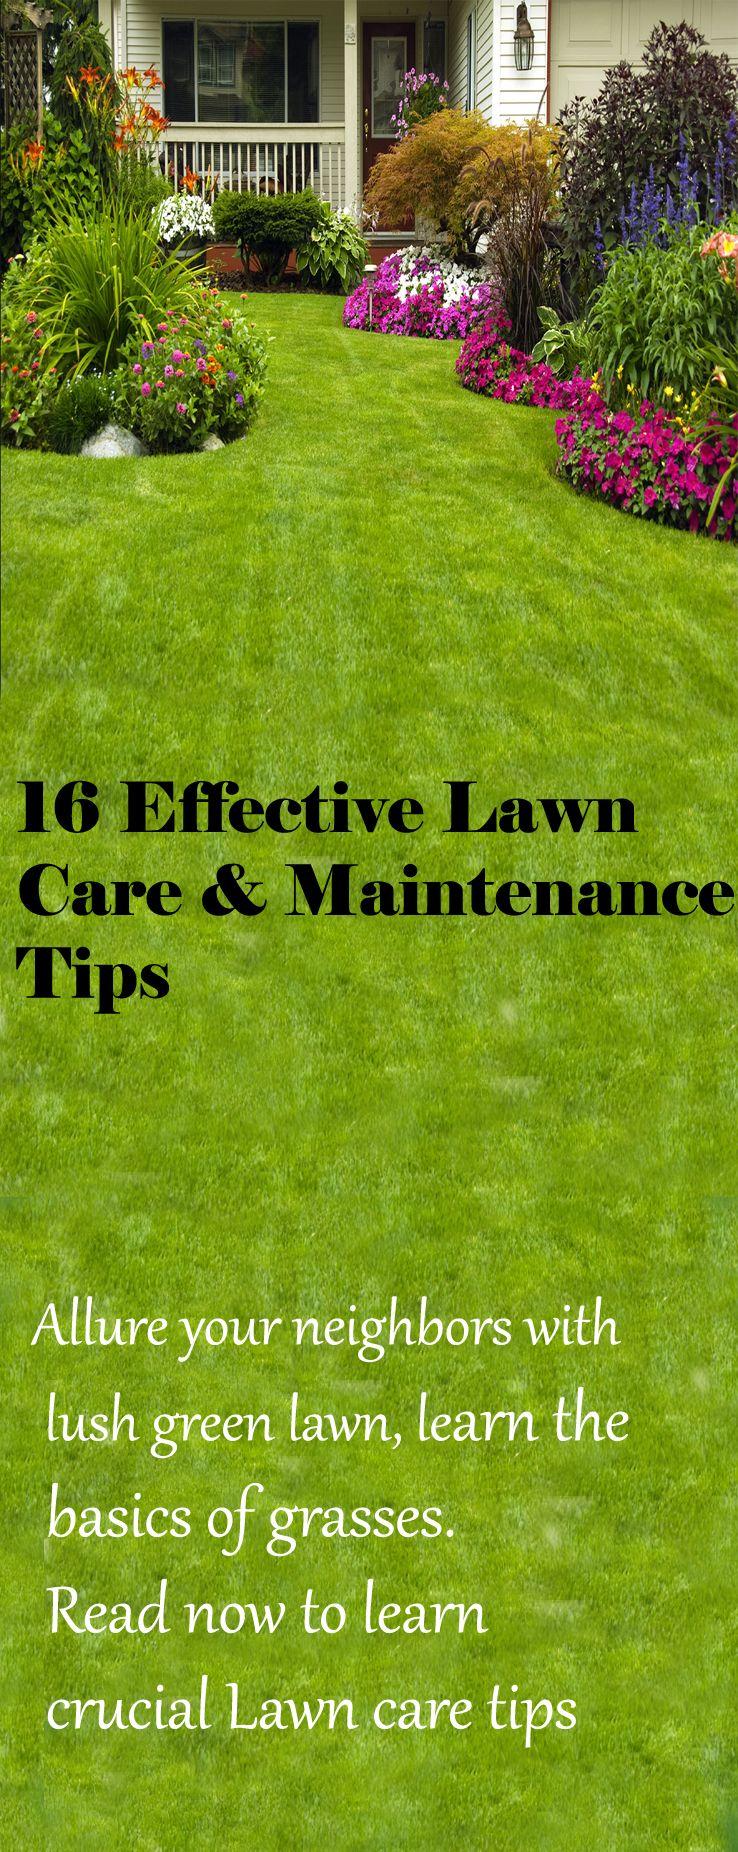 16 Tips for Lawncare Lawn care, Lush lawn, Lawn care tips